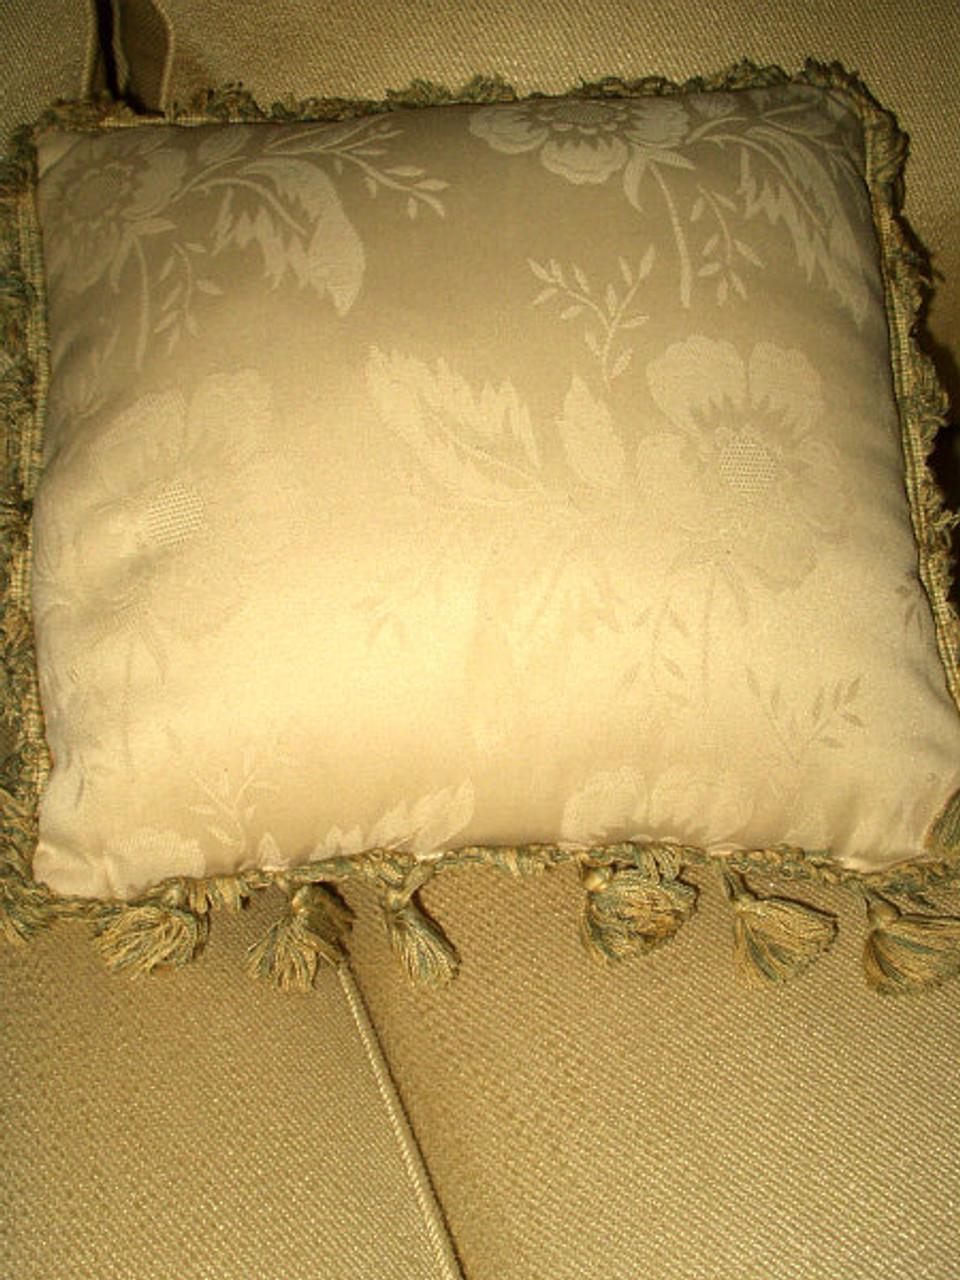 Brocade Rosette Ribbon Basket Embroidery Throw Pillow